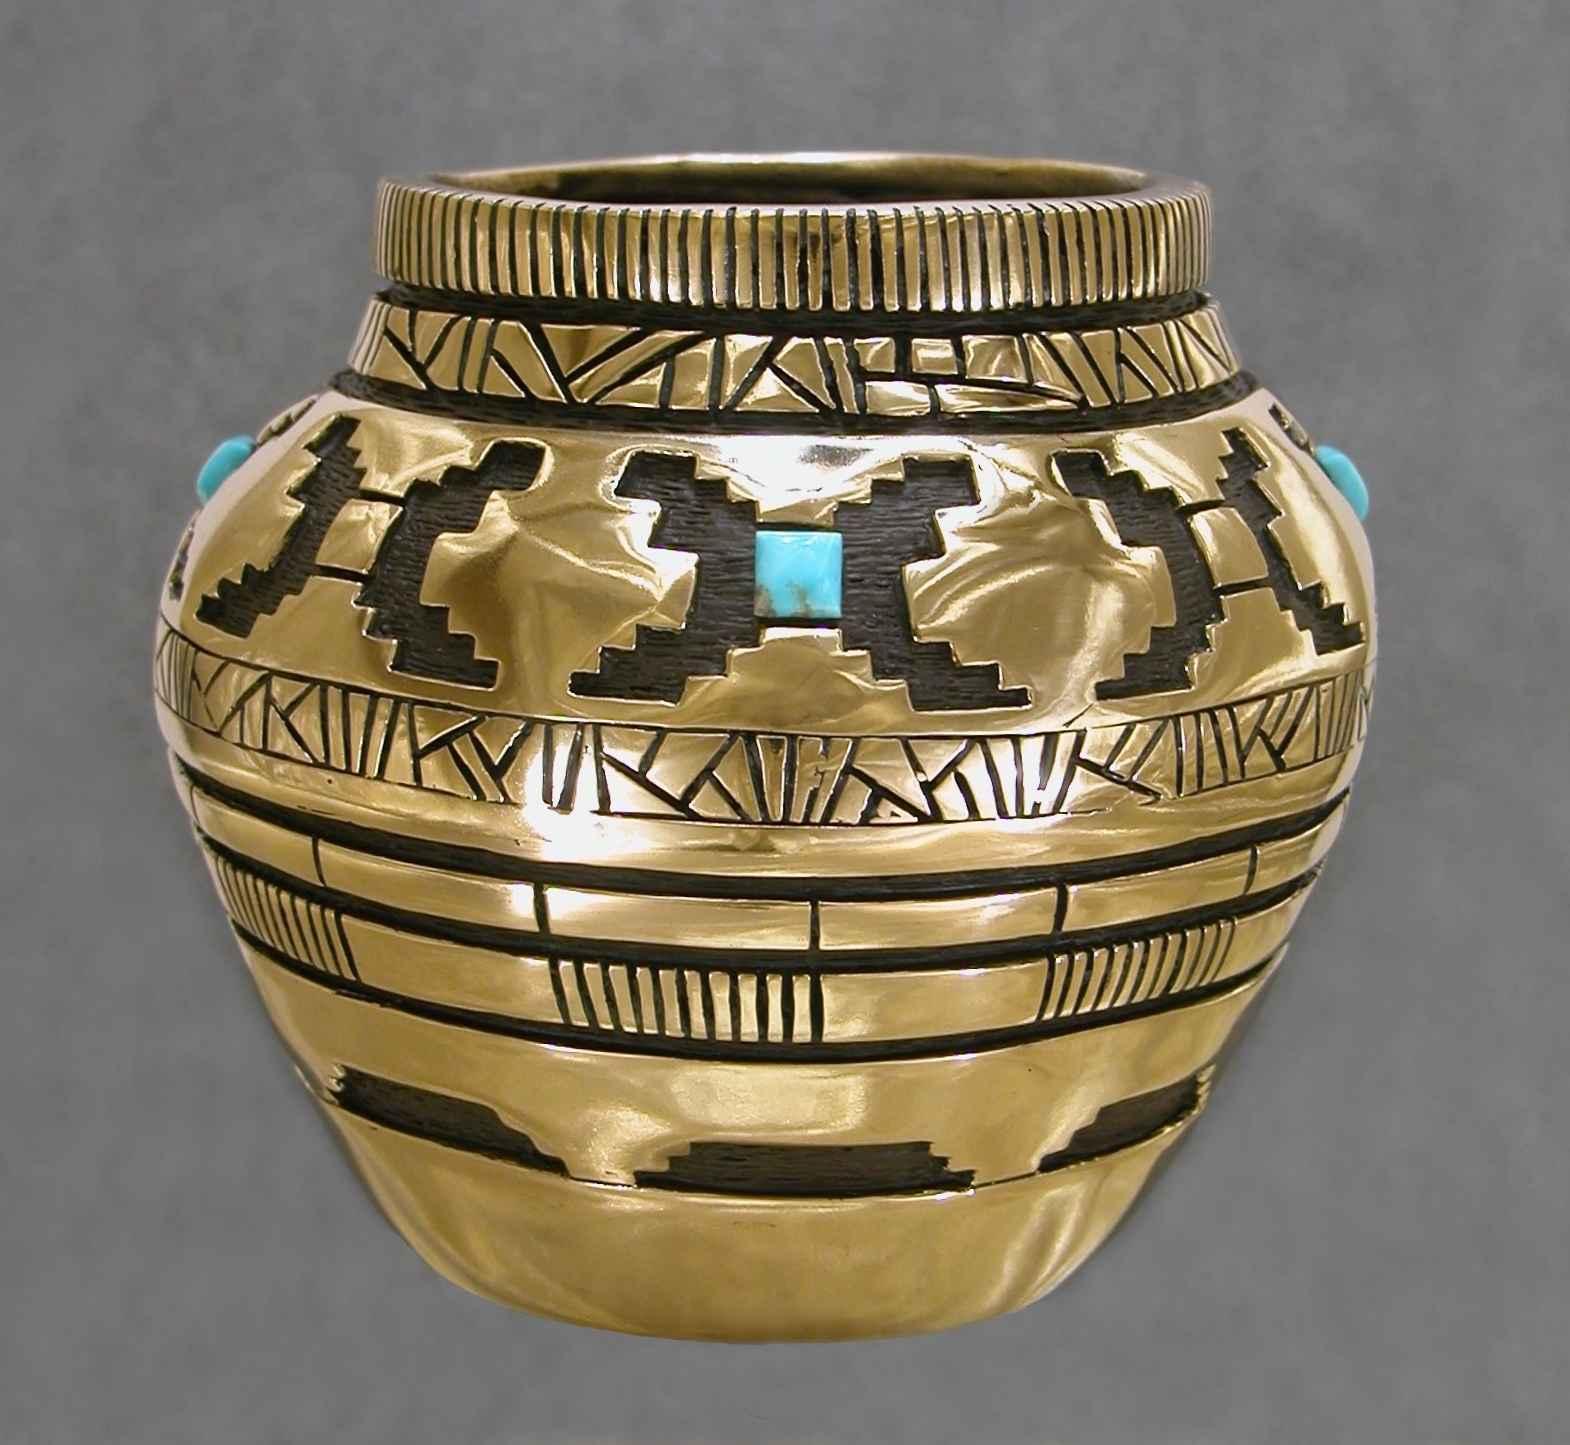 Bronze Vessel With Tu... by Mr. Fred Ortiz - Masterpiece Online